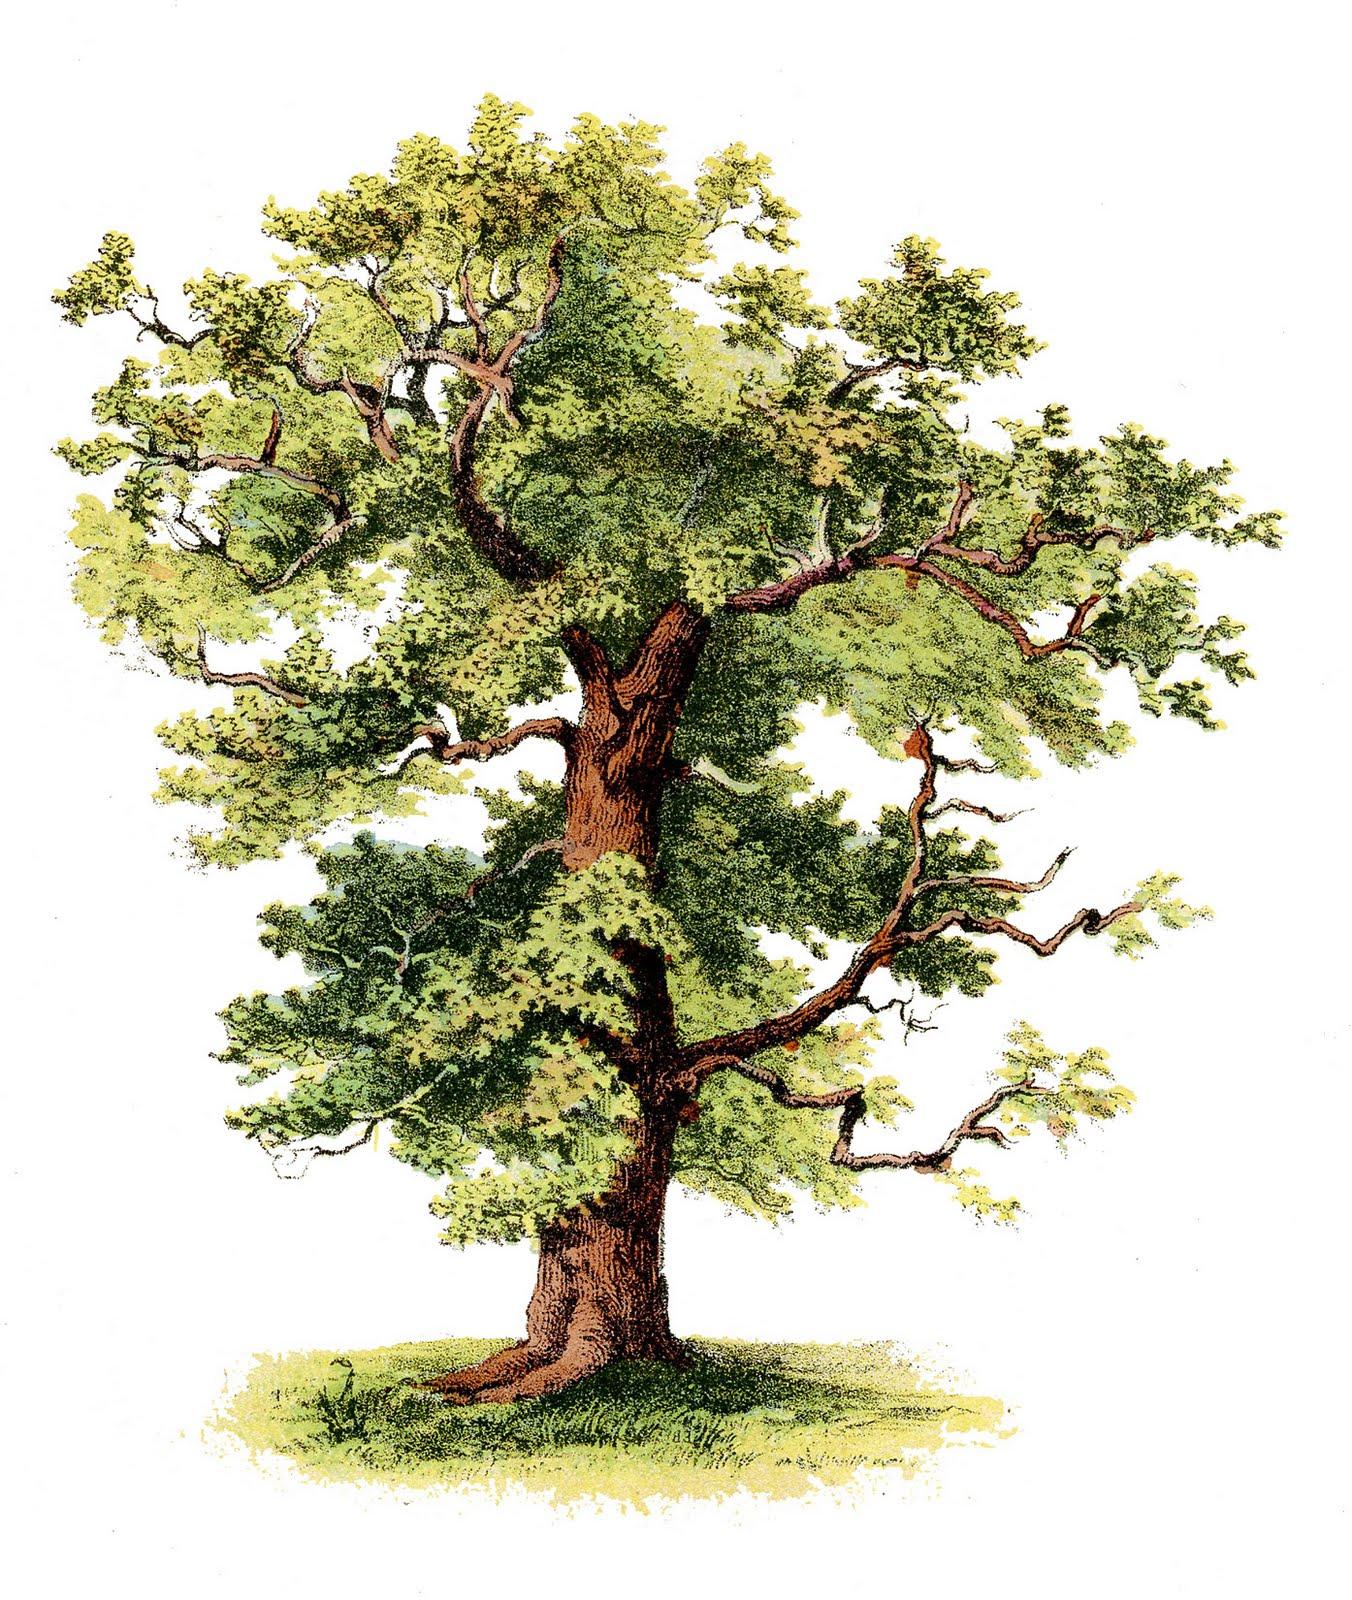 Antique Clip Art Beautiful Tree The Grap-Antique Clip Art Beautiful Tree The Graphics Fairy-8